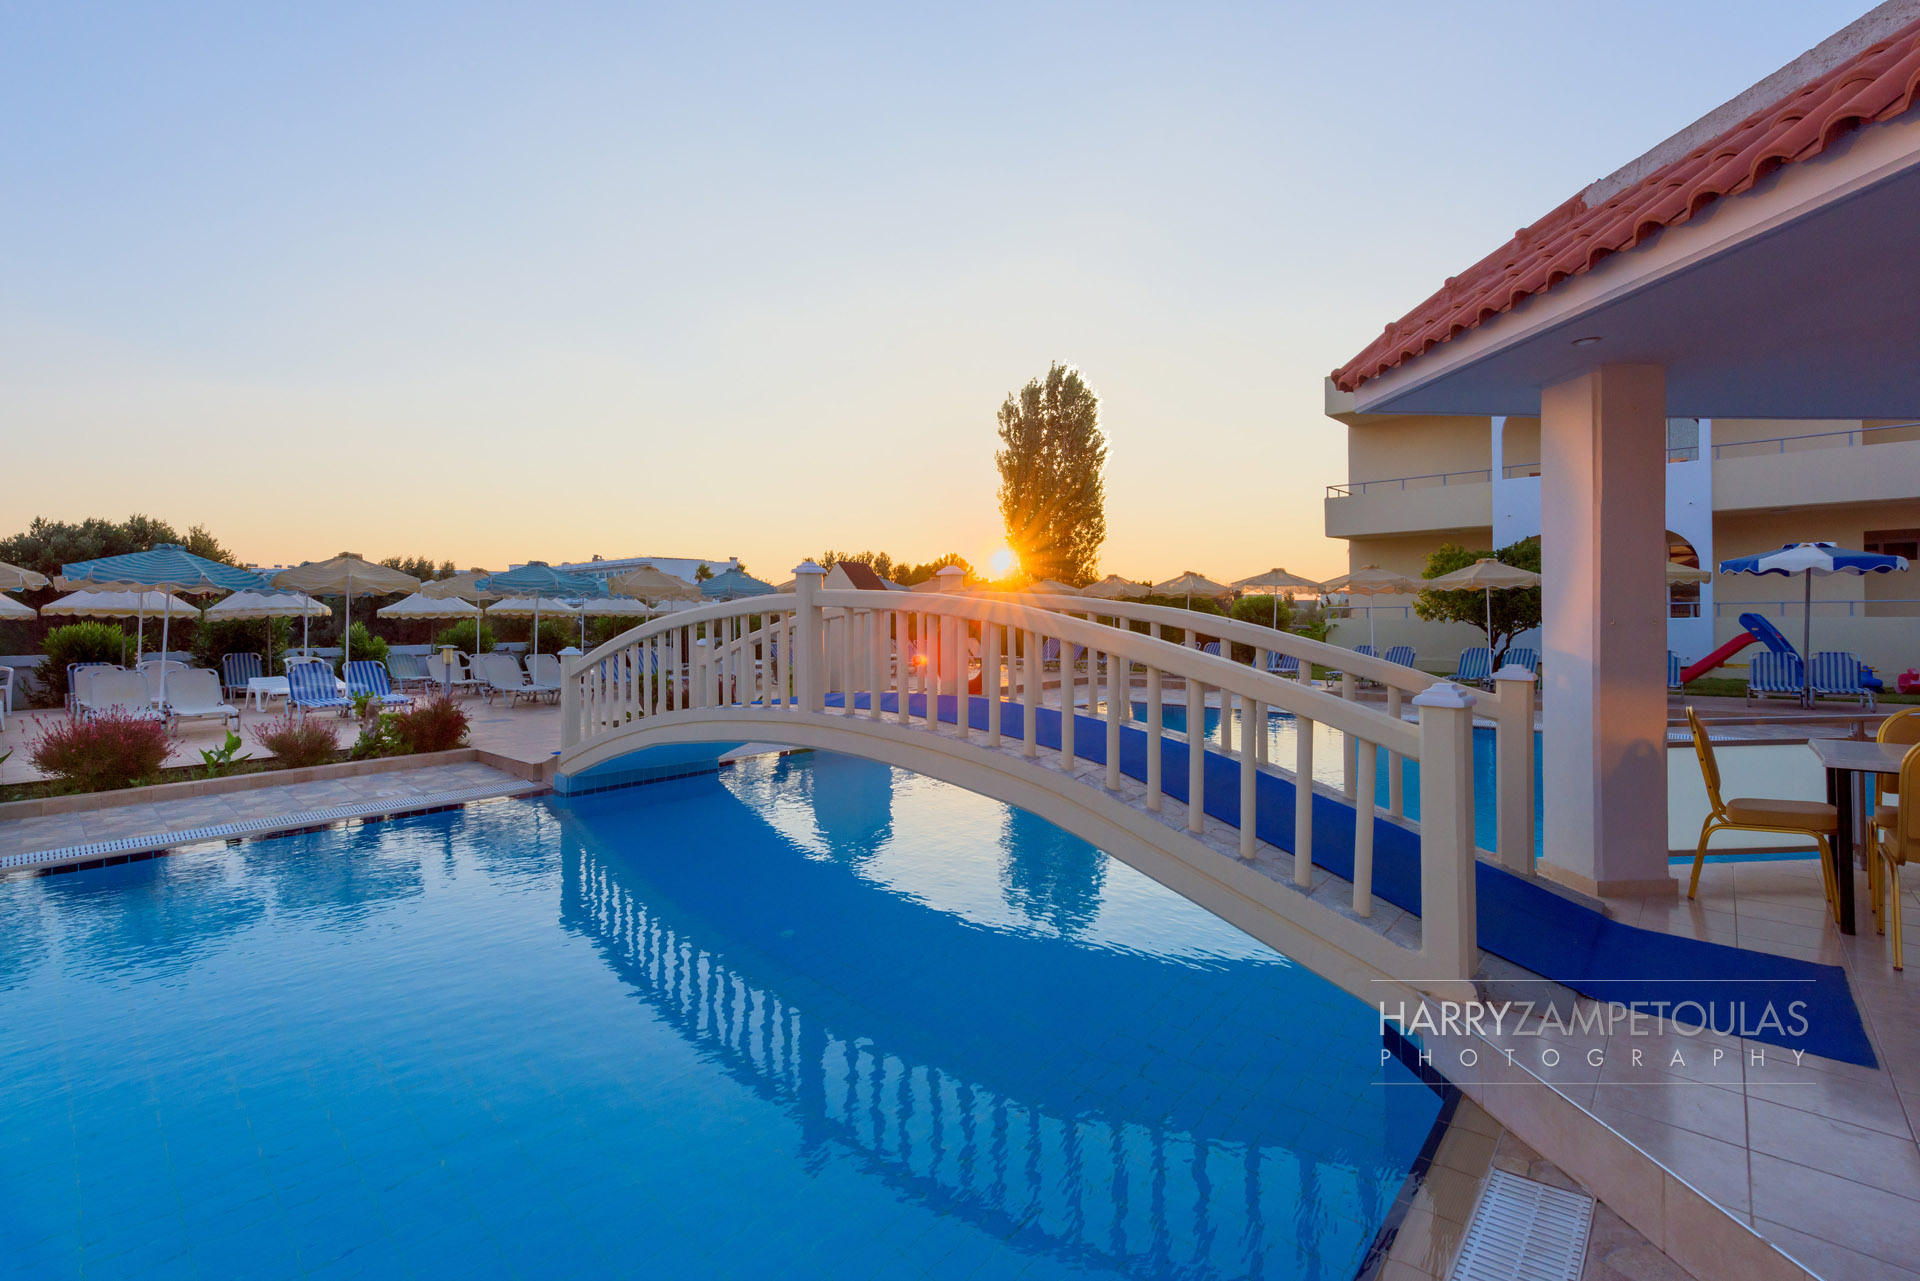 Hotel Memphis Beach, Kolymbia, Rhodes – Hotel Photography Harry Zampetoulas